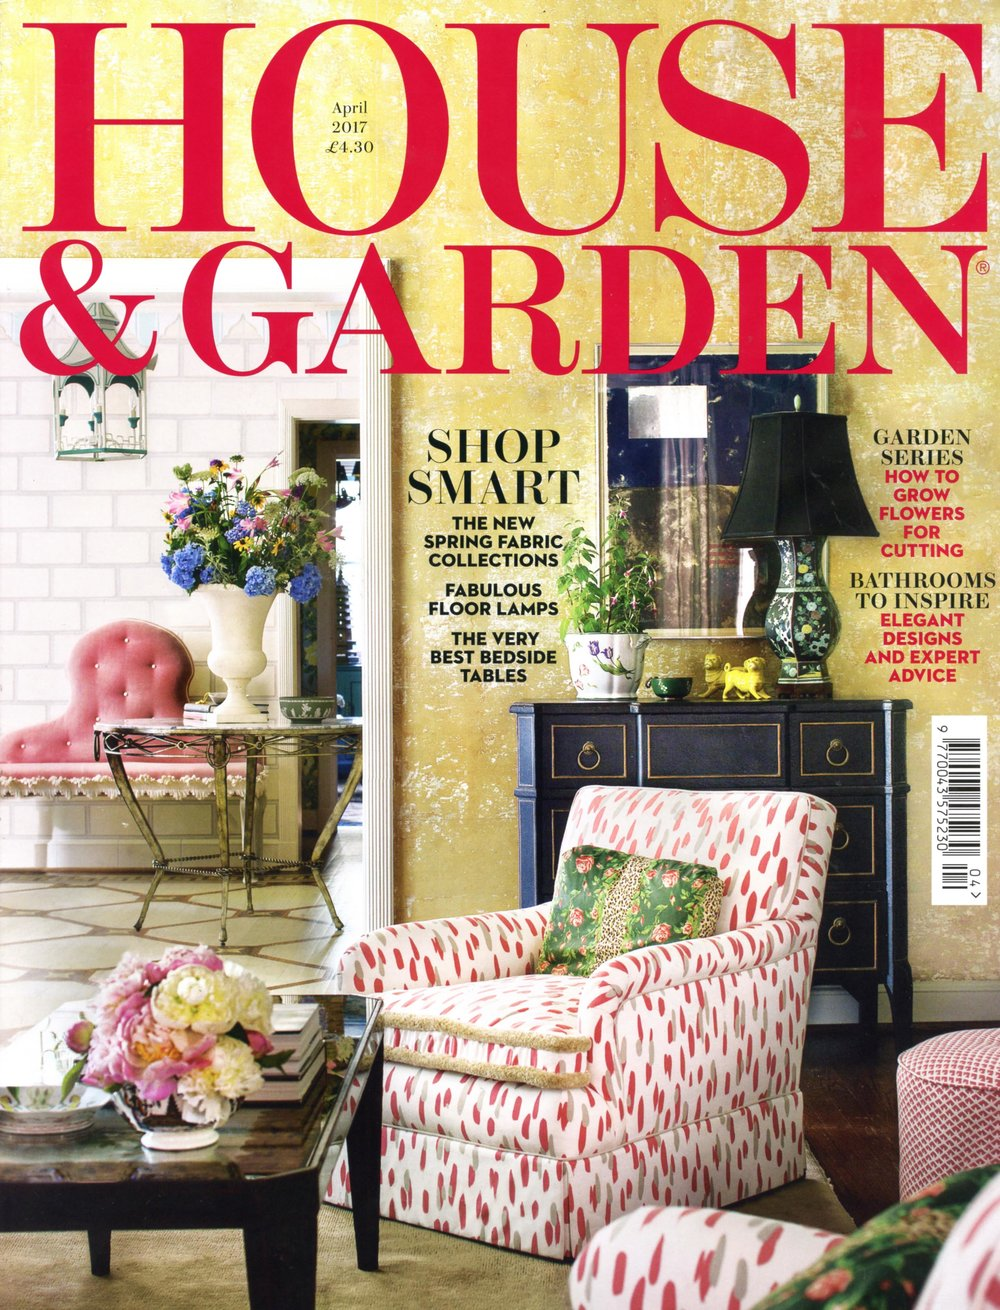 House & Garden April 2017.jpg